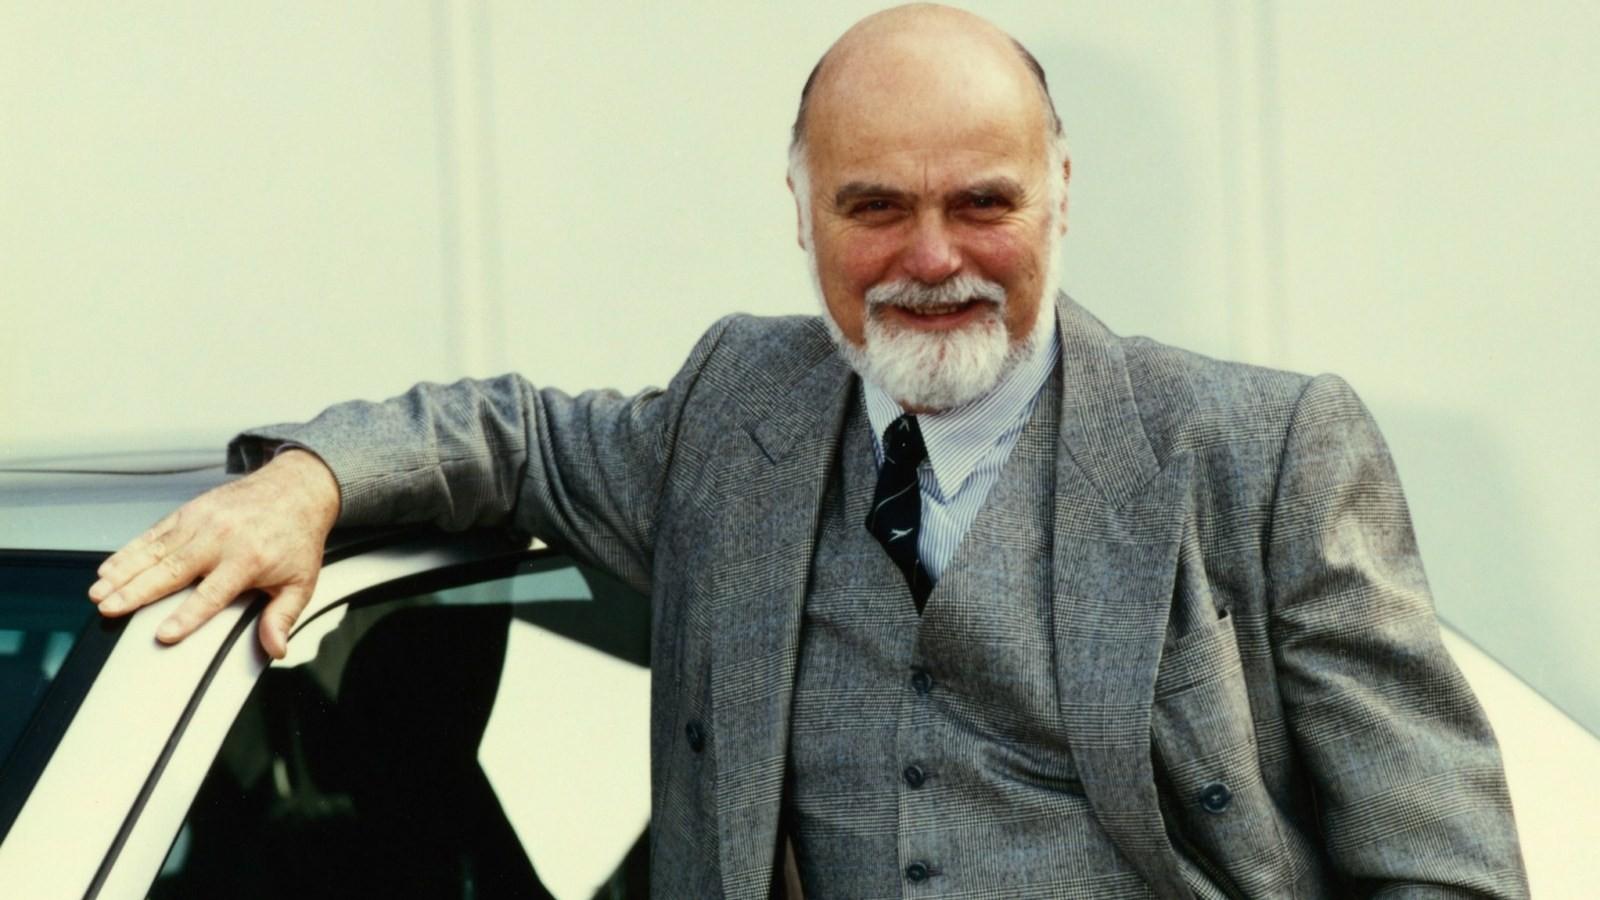 Bruno Sacco, former Mercedes-Benz chief designer